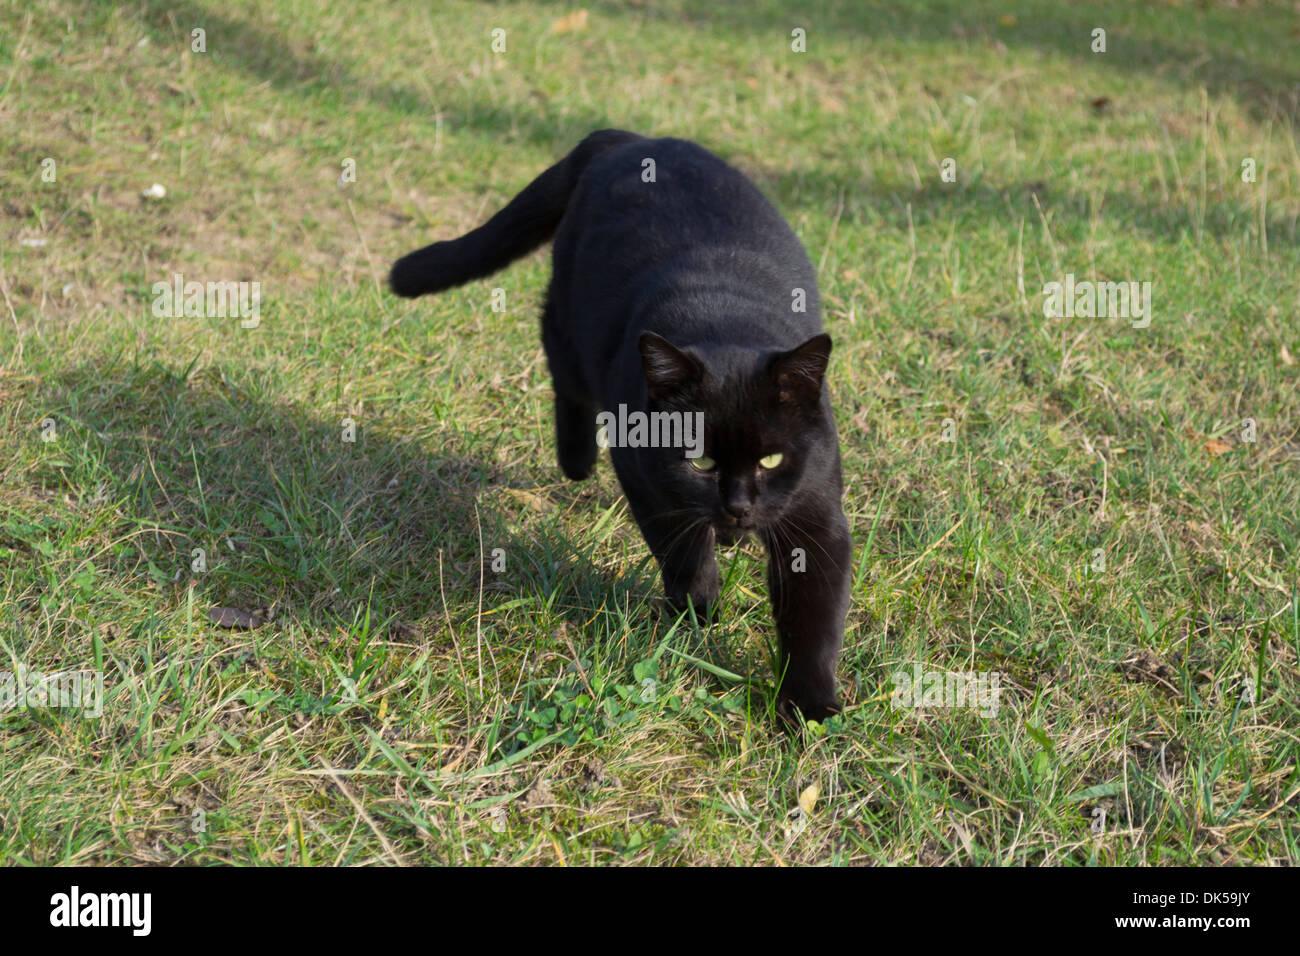 black-cat-walking-on-grass-in-the-garden